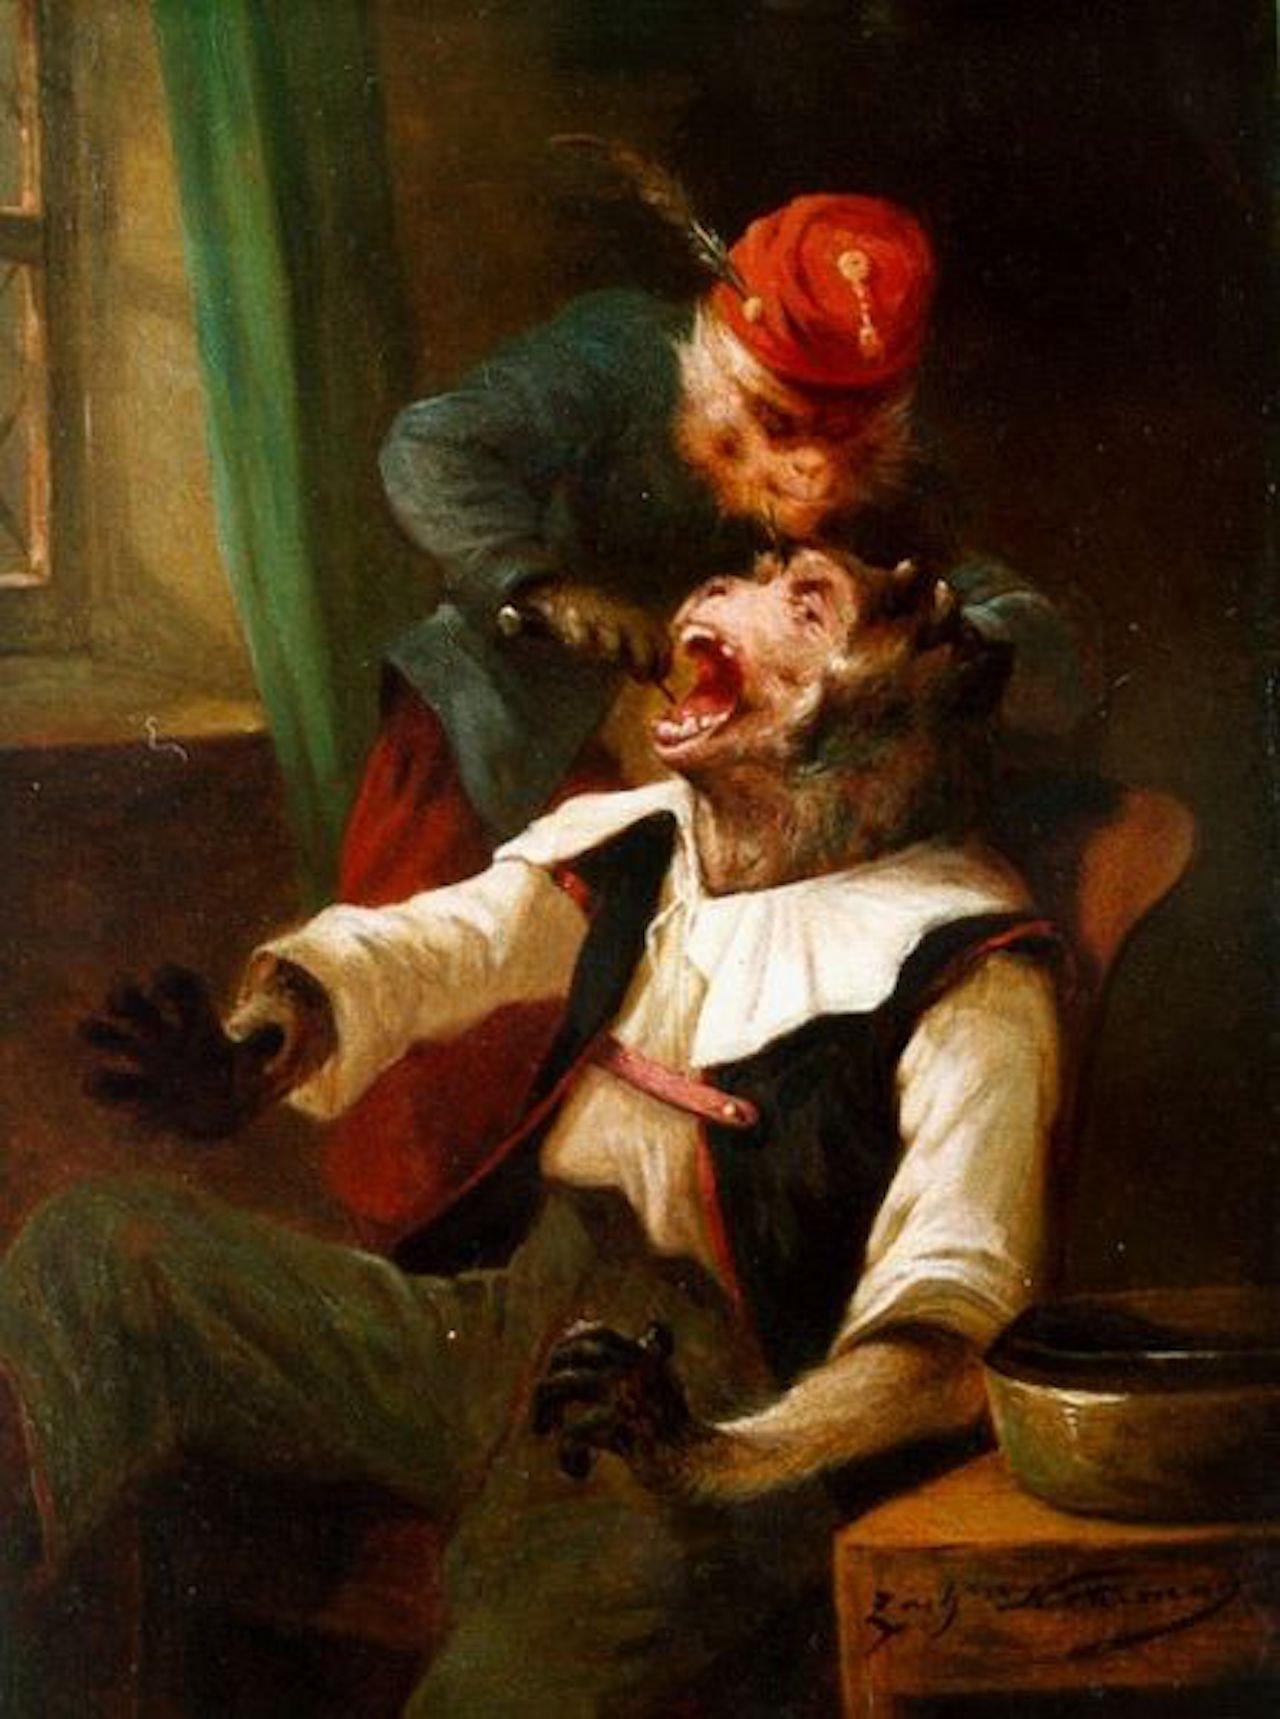 zacharie_noterman_-_the_monkey_dentist_2